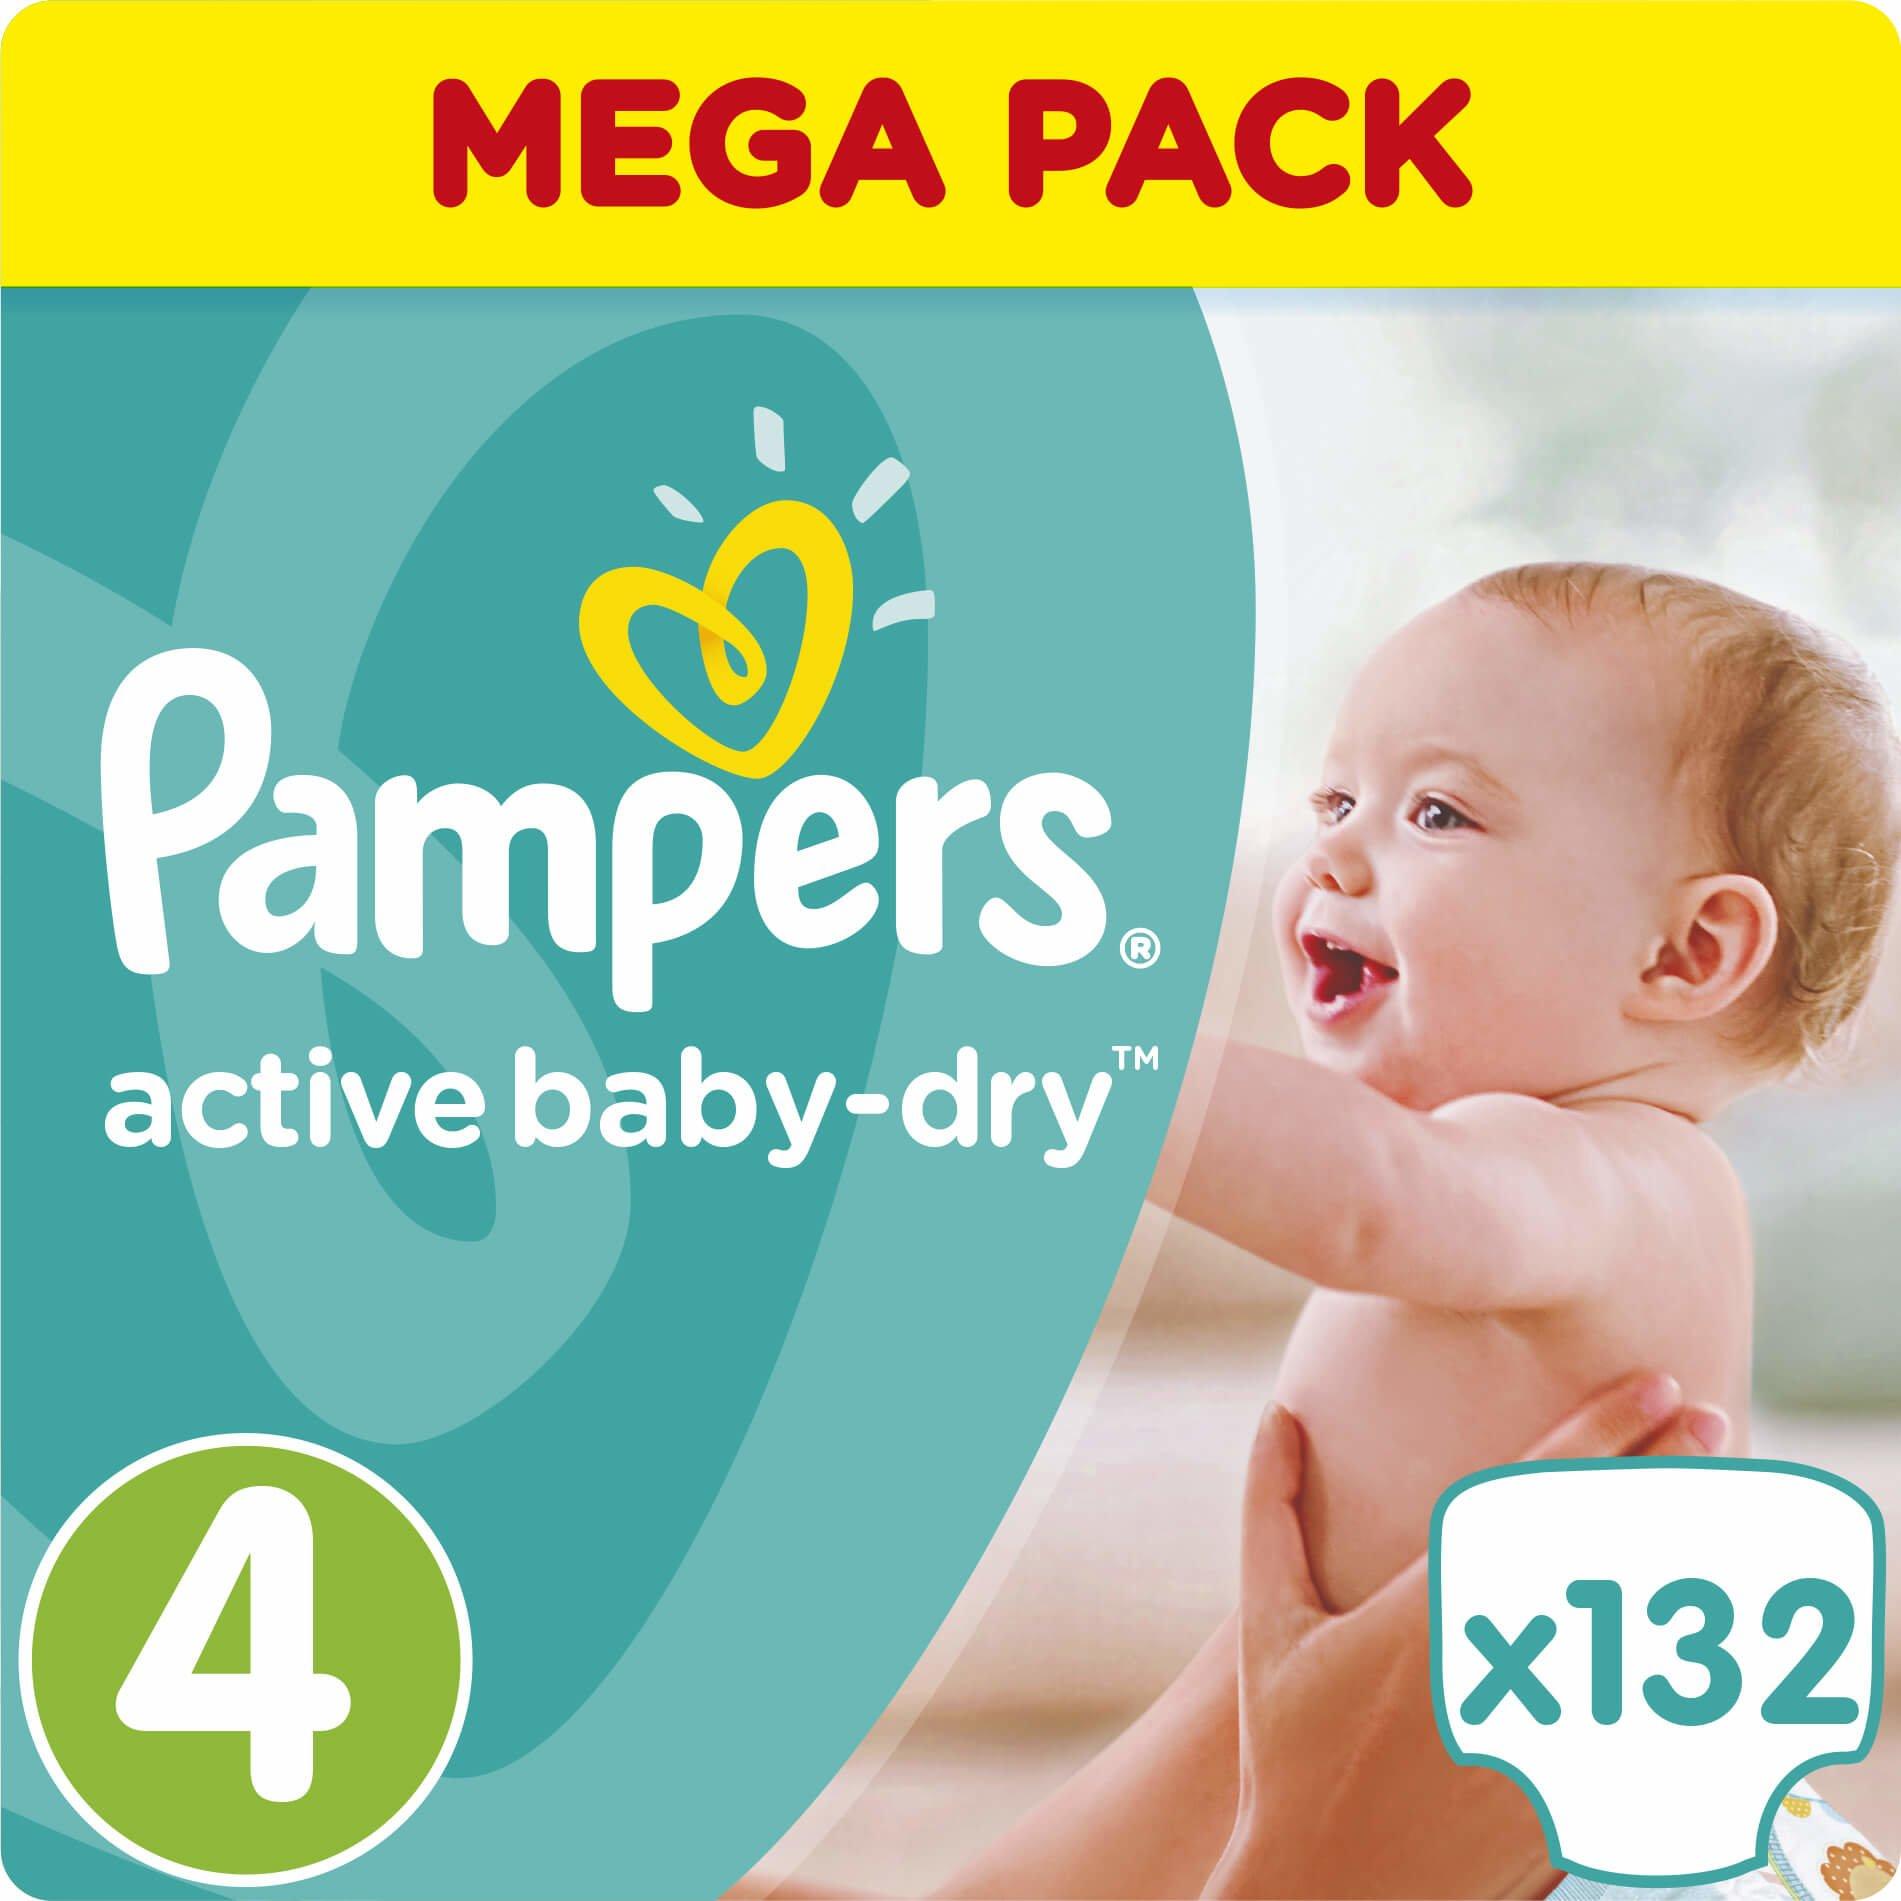 Pampers Active Baby Dry Mega Pack No4 (8-14kg) 132 πάνες, μόνο 0,27€ / πάνα μητέρα παιδί   περιποίηση για το μωρό   πάνες για το μωρό